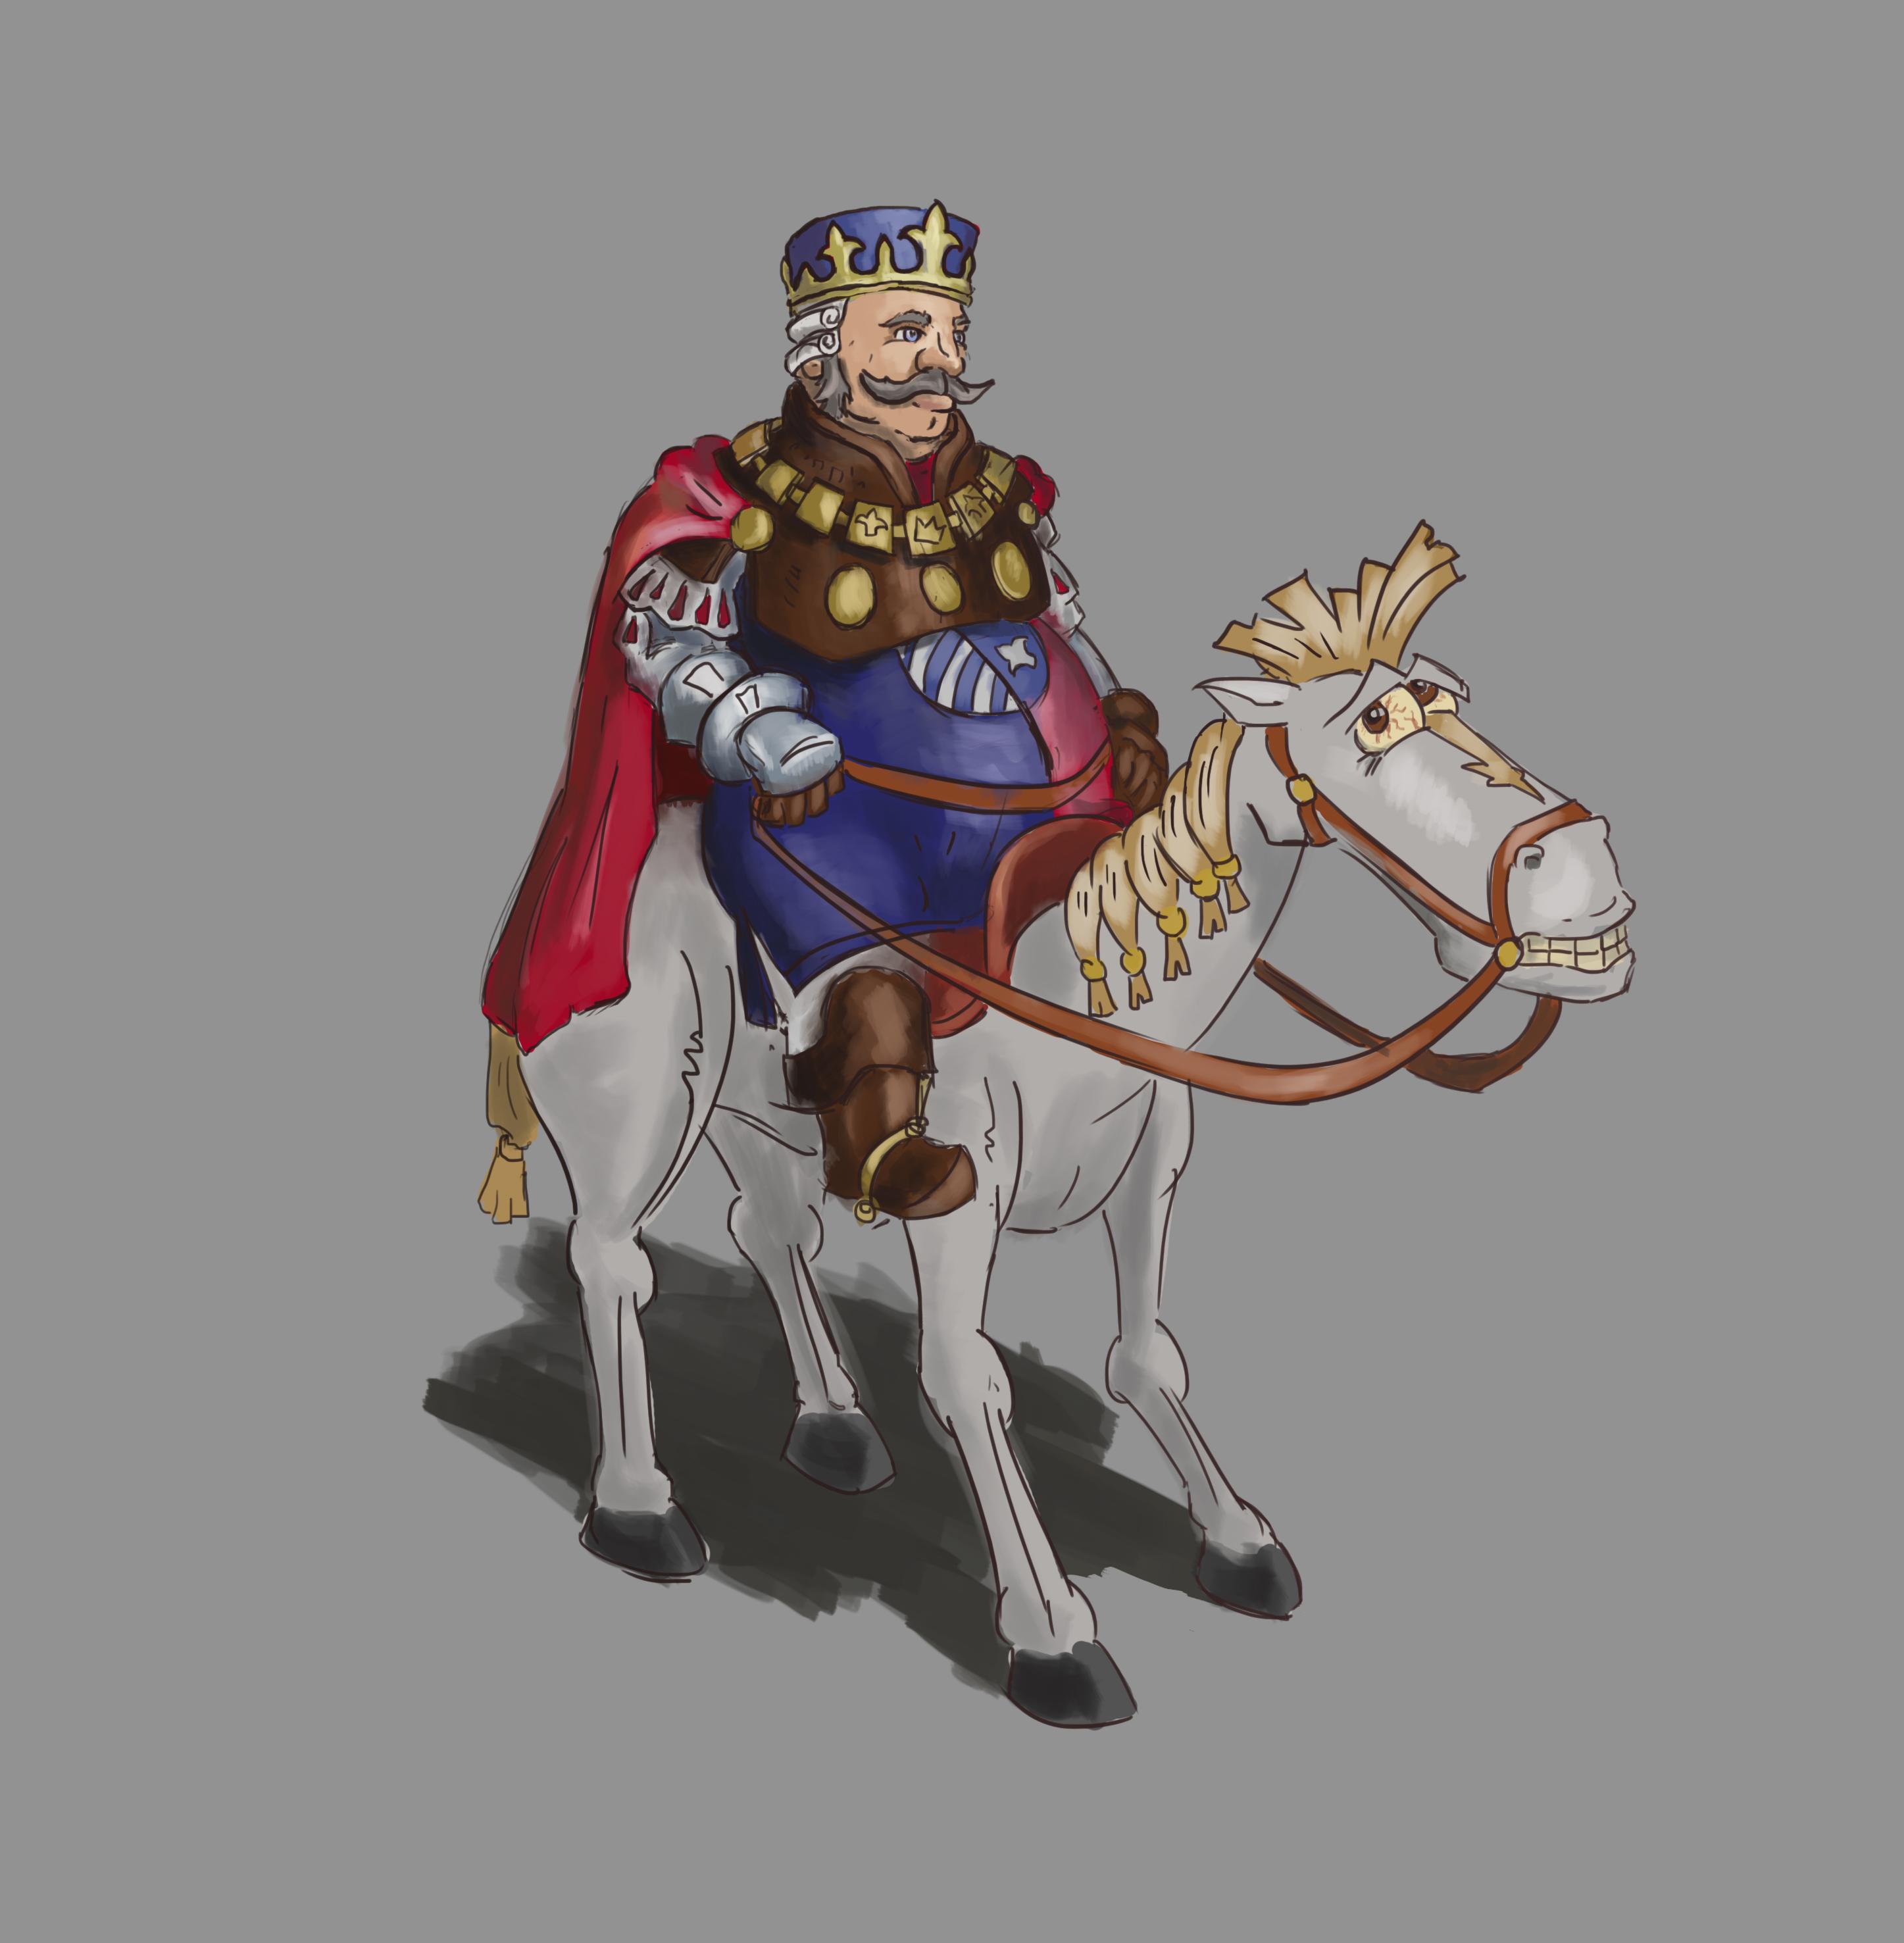 король на коне.jpg